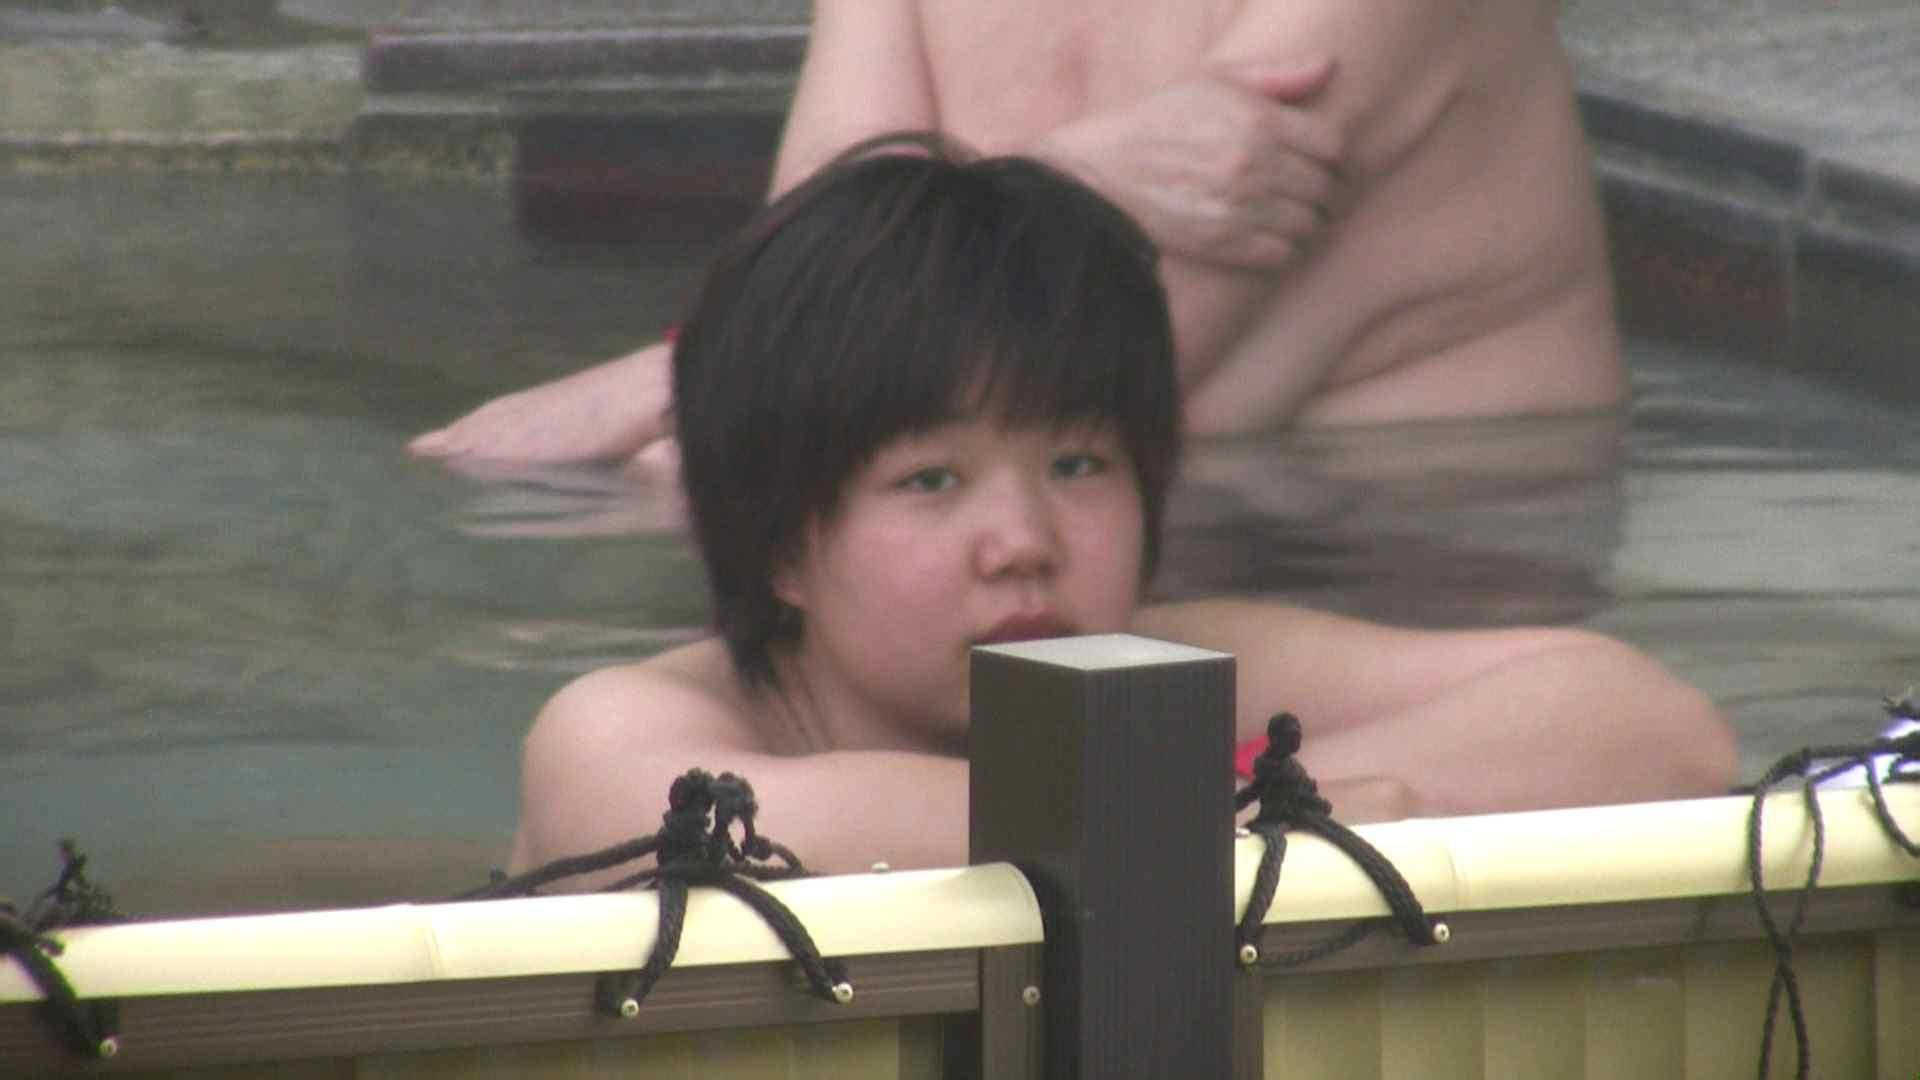 Aquaな露天風呂Vol.53【VIP限定】 女体盗撮  93連発 69